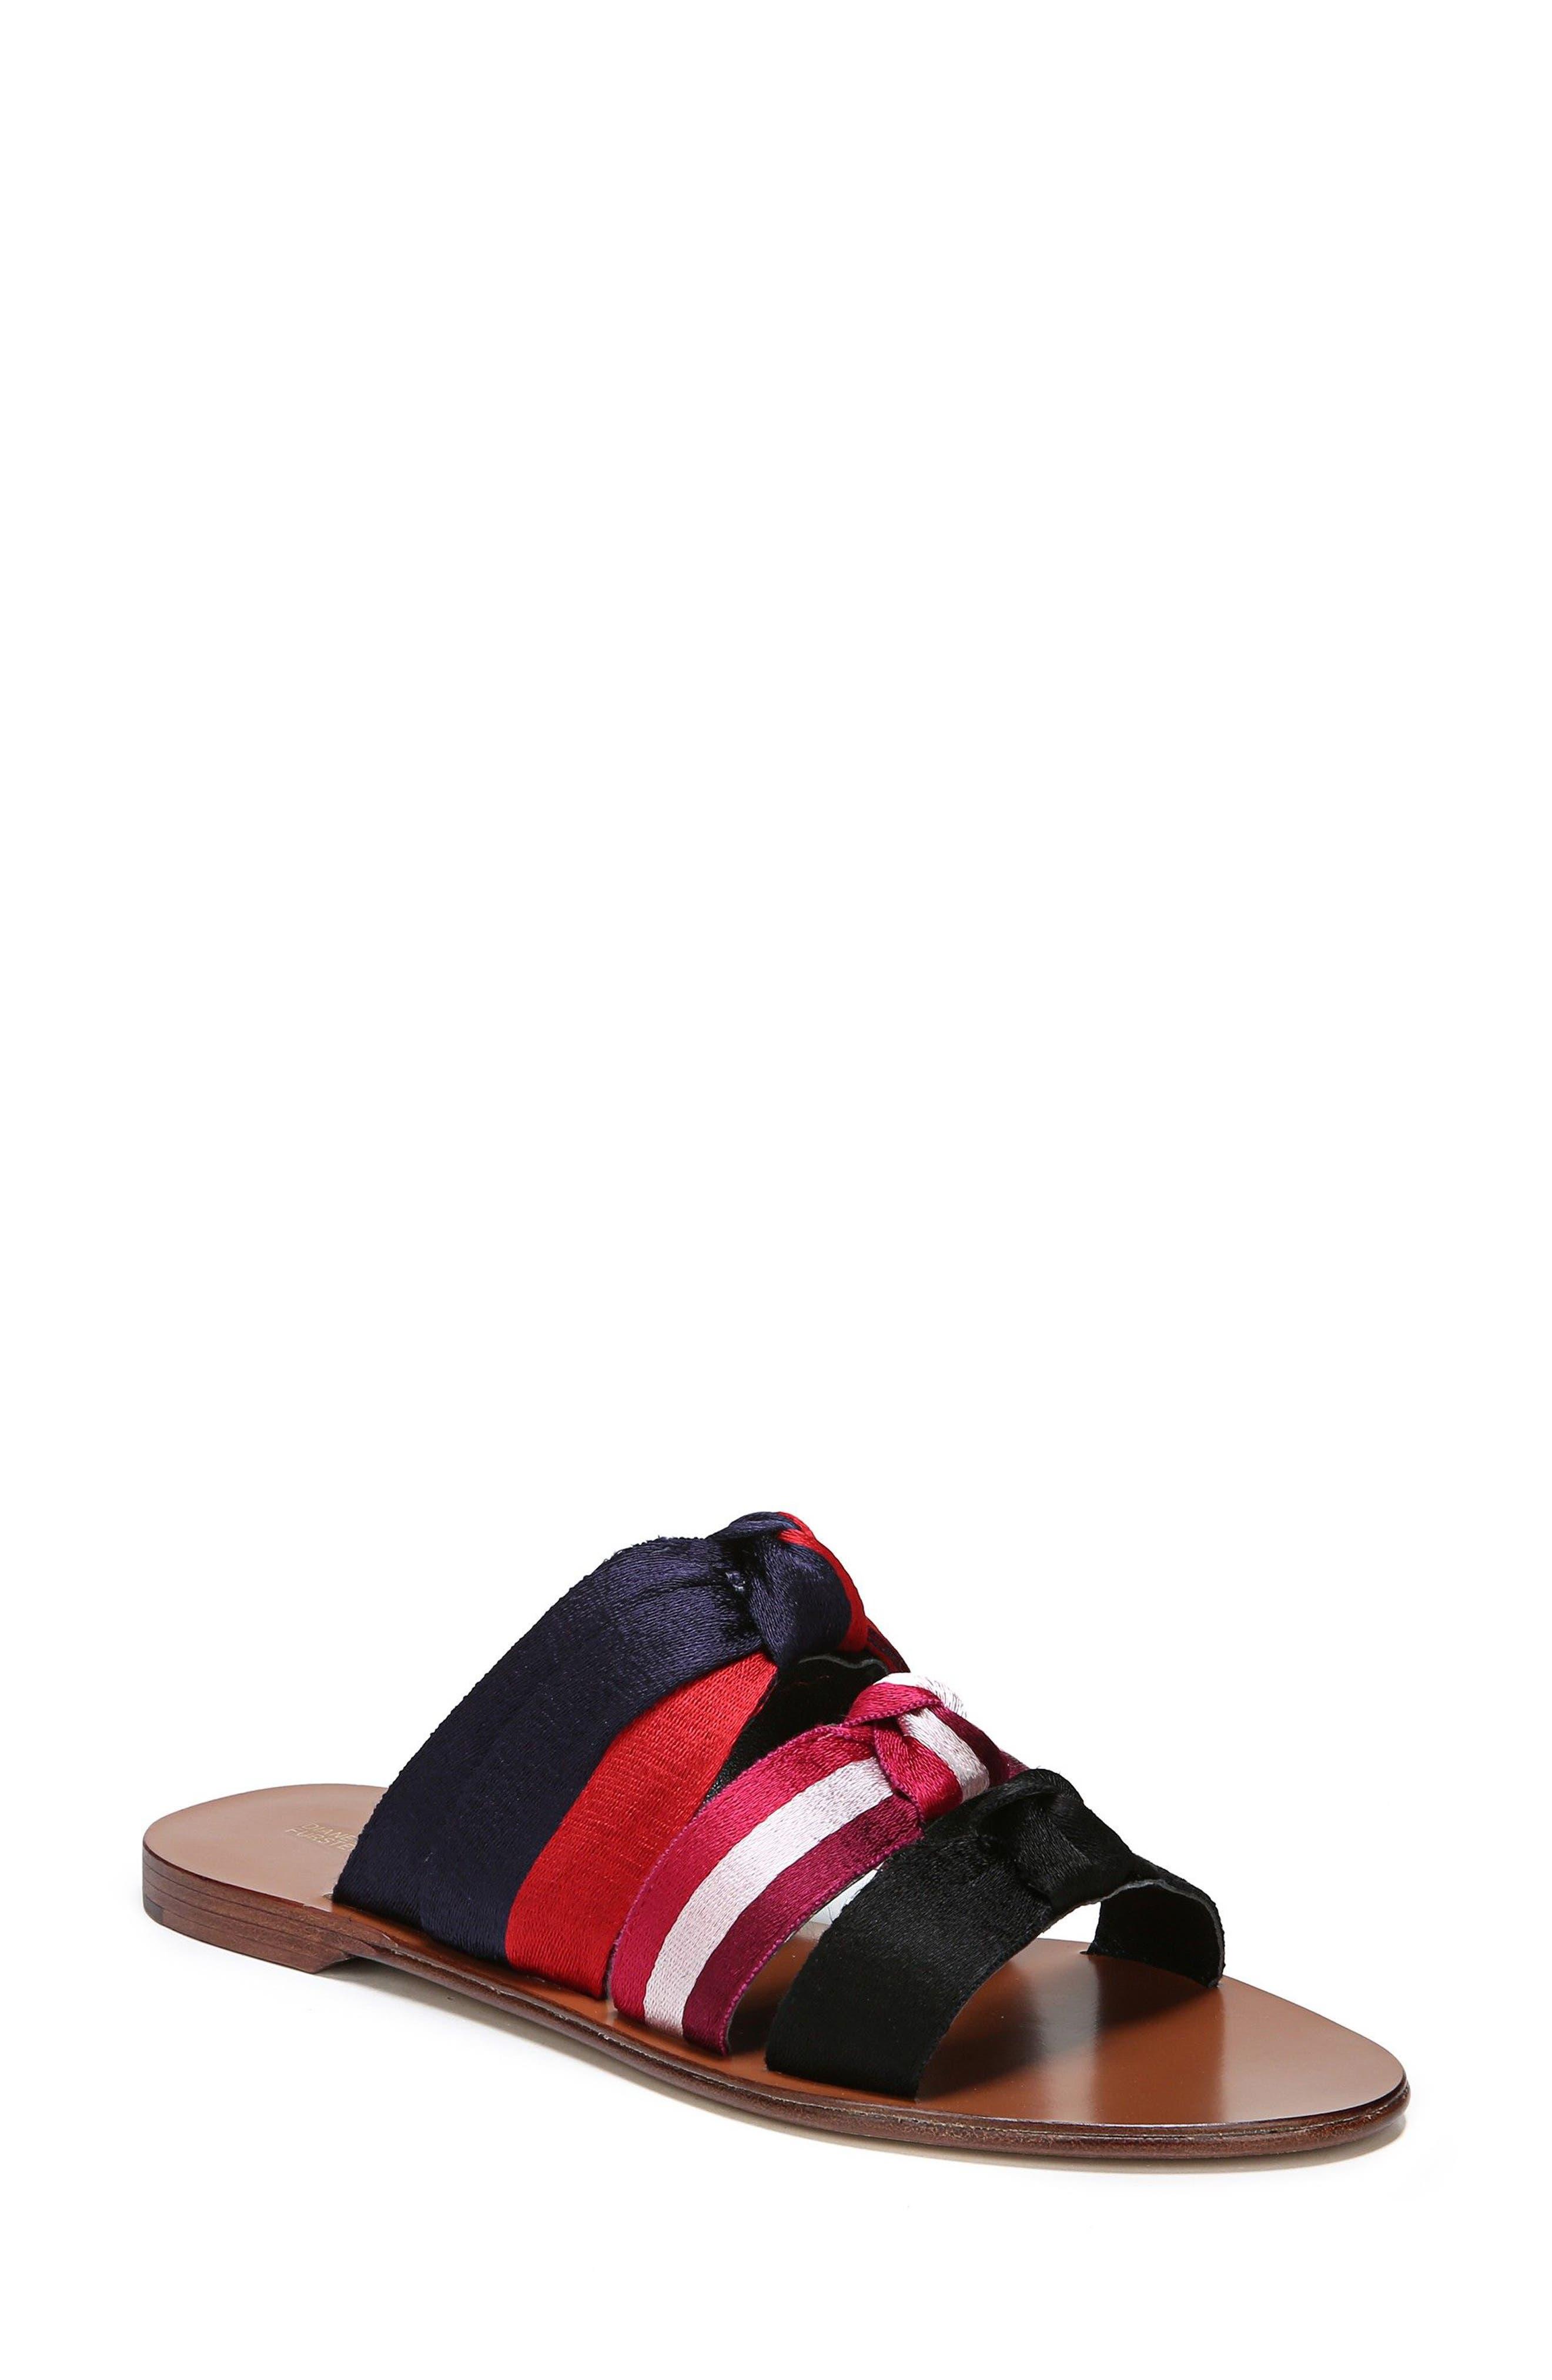 Bree Strappy Slide Sandal,                         Main,                         color,